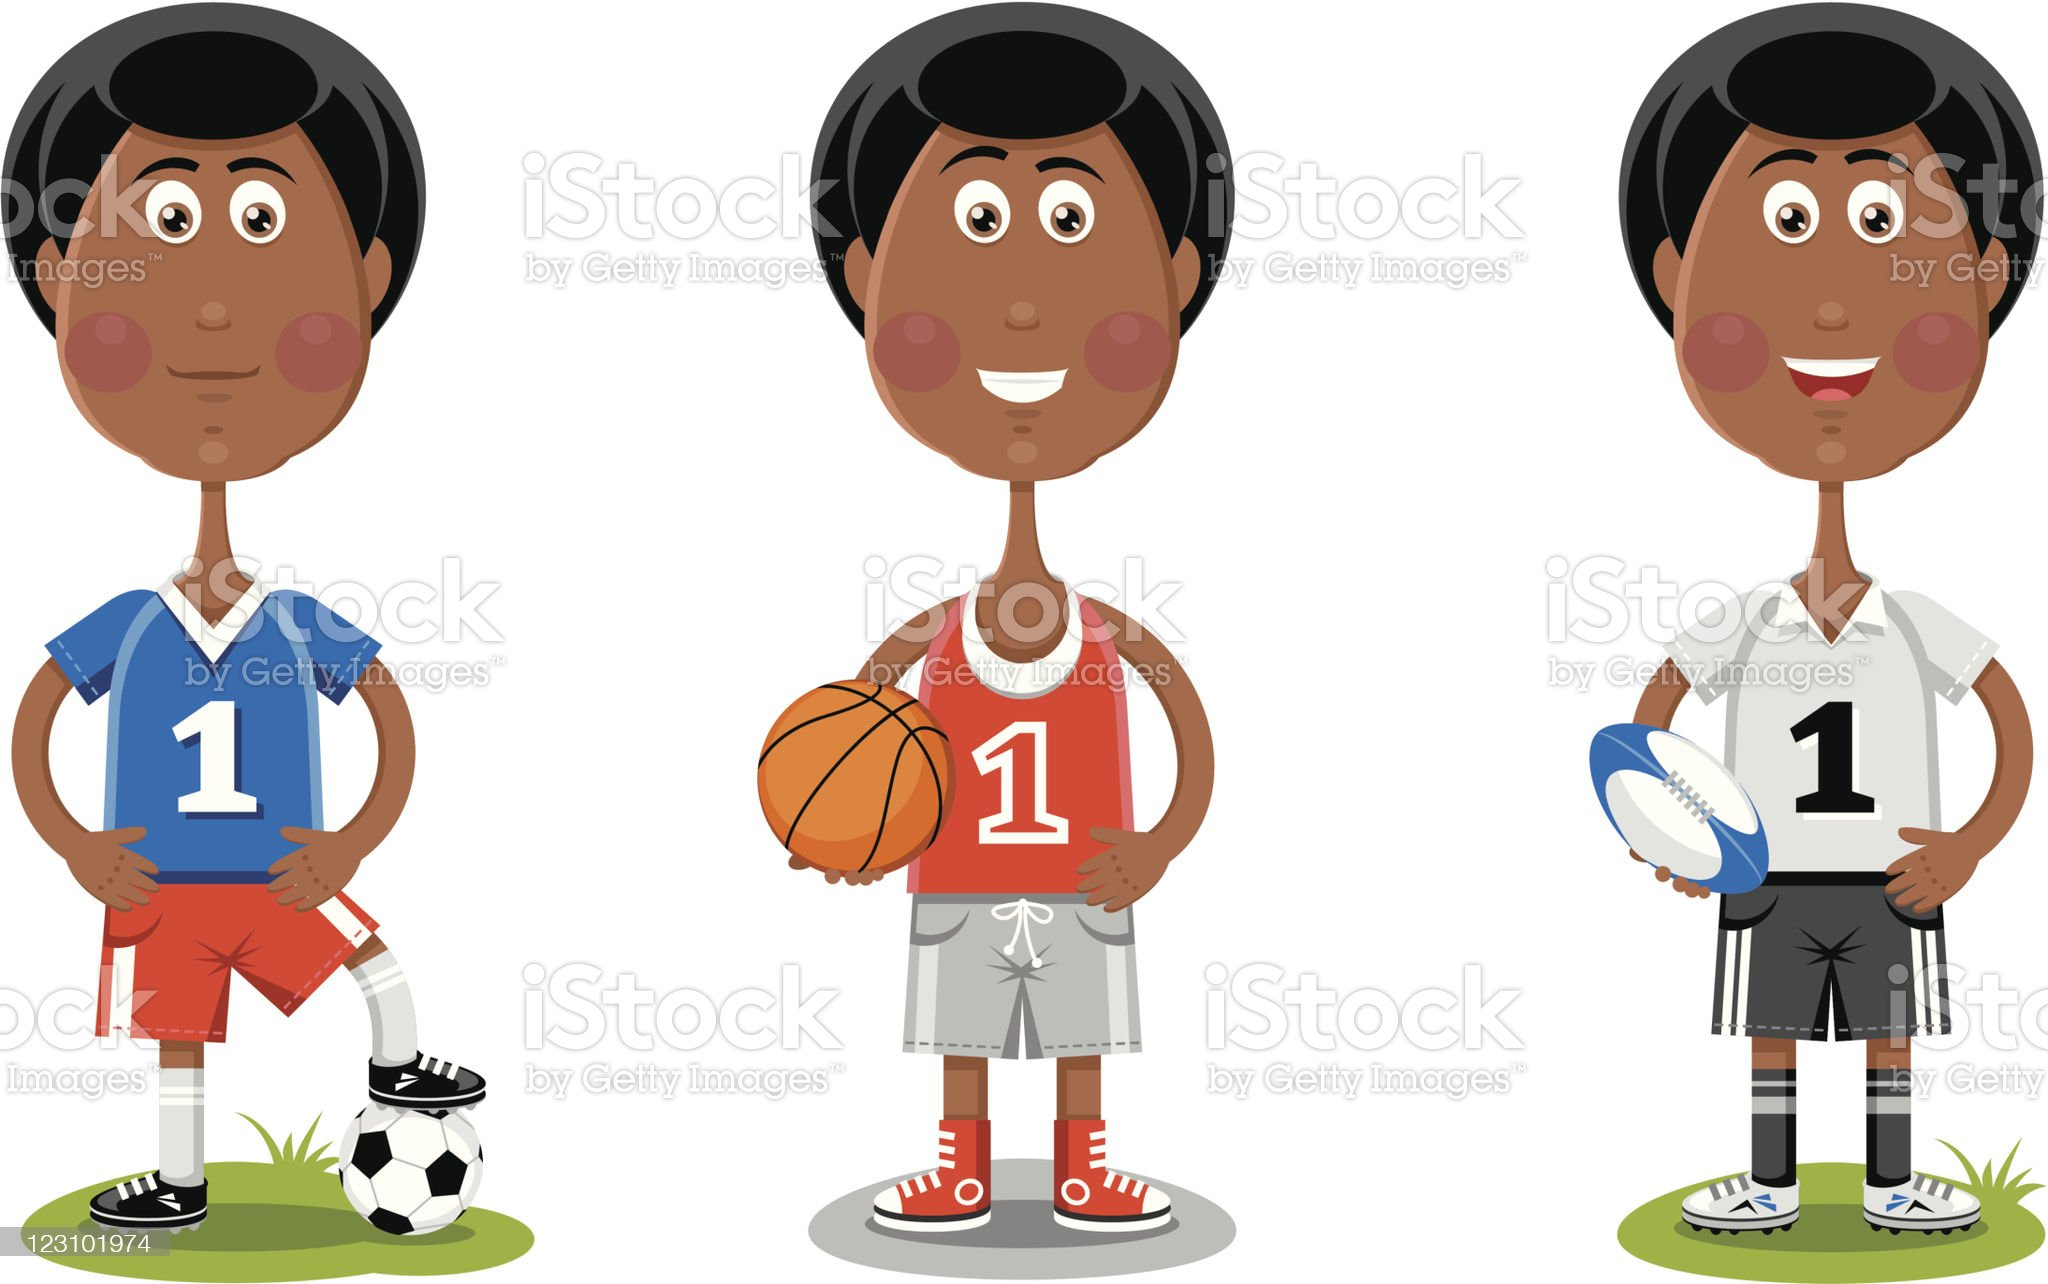 Cute sportsmen royalty-free stock vector art